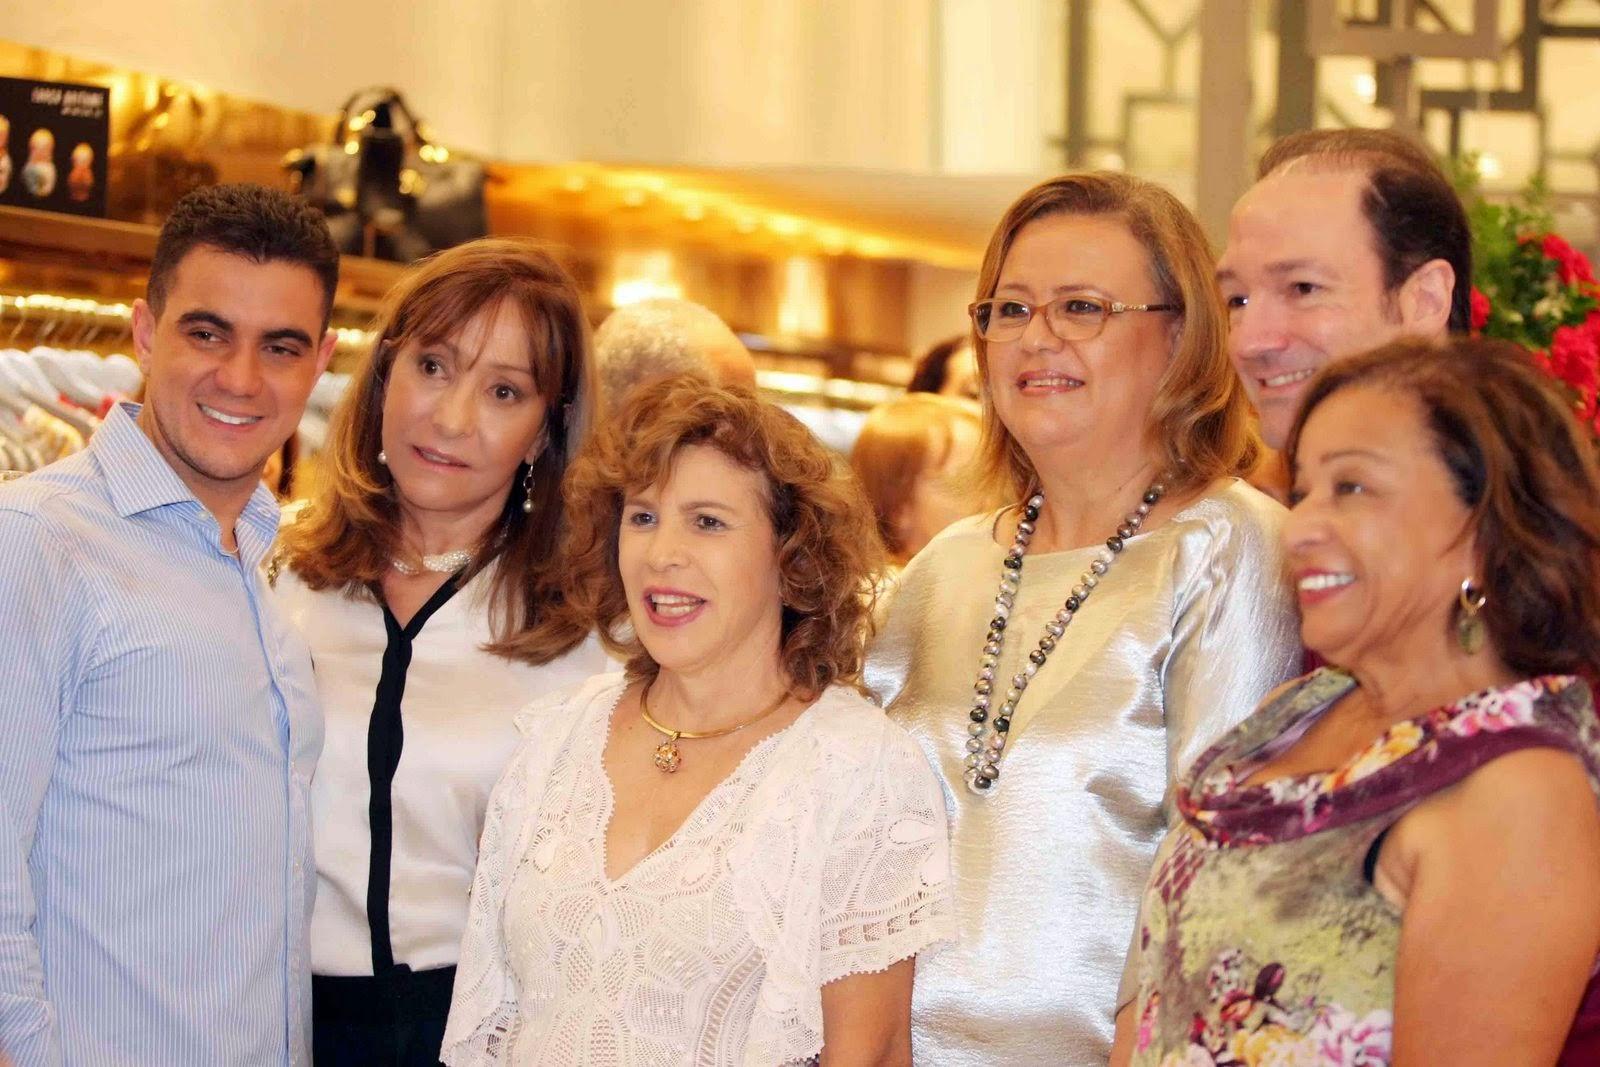 Lançamento da Loja Lança Perfume em Brasília